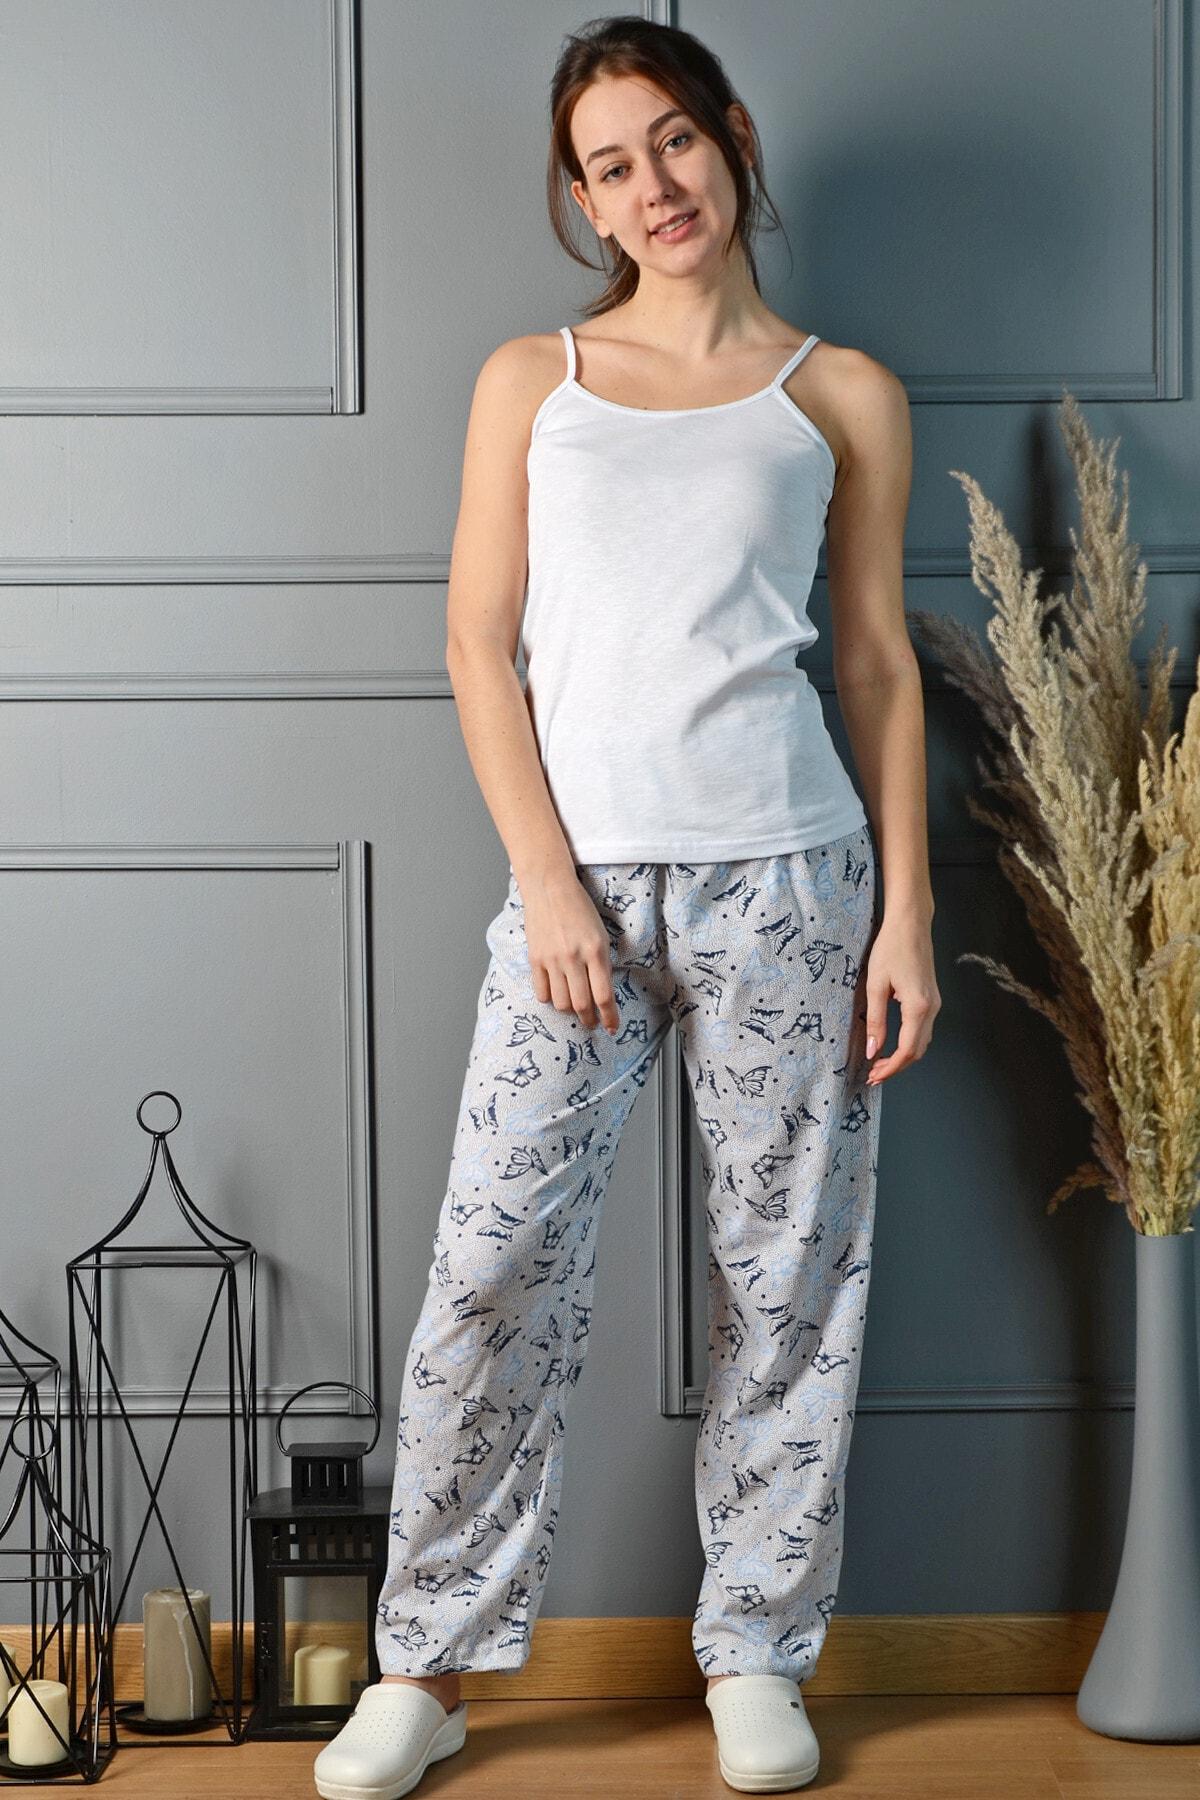 PİNKMARK Kadın Renkli Pijama Altı Pmplt24195 1